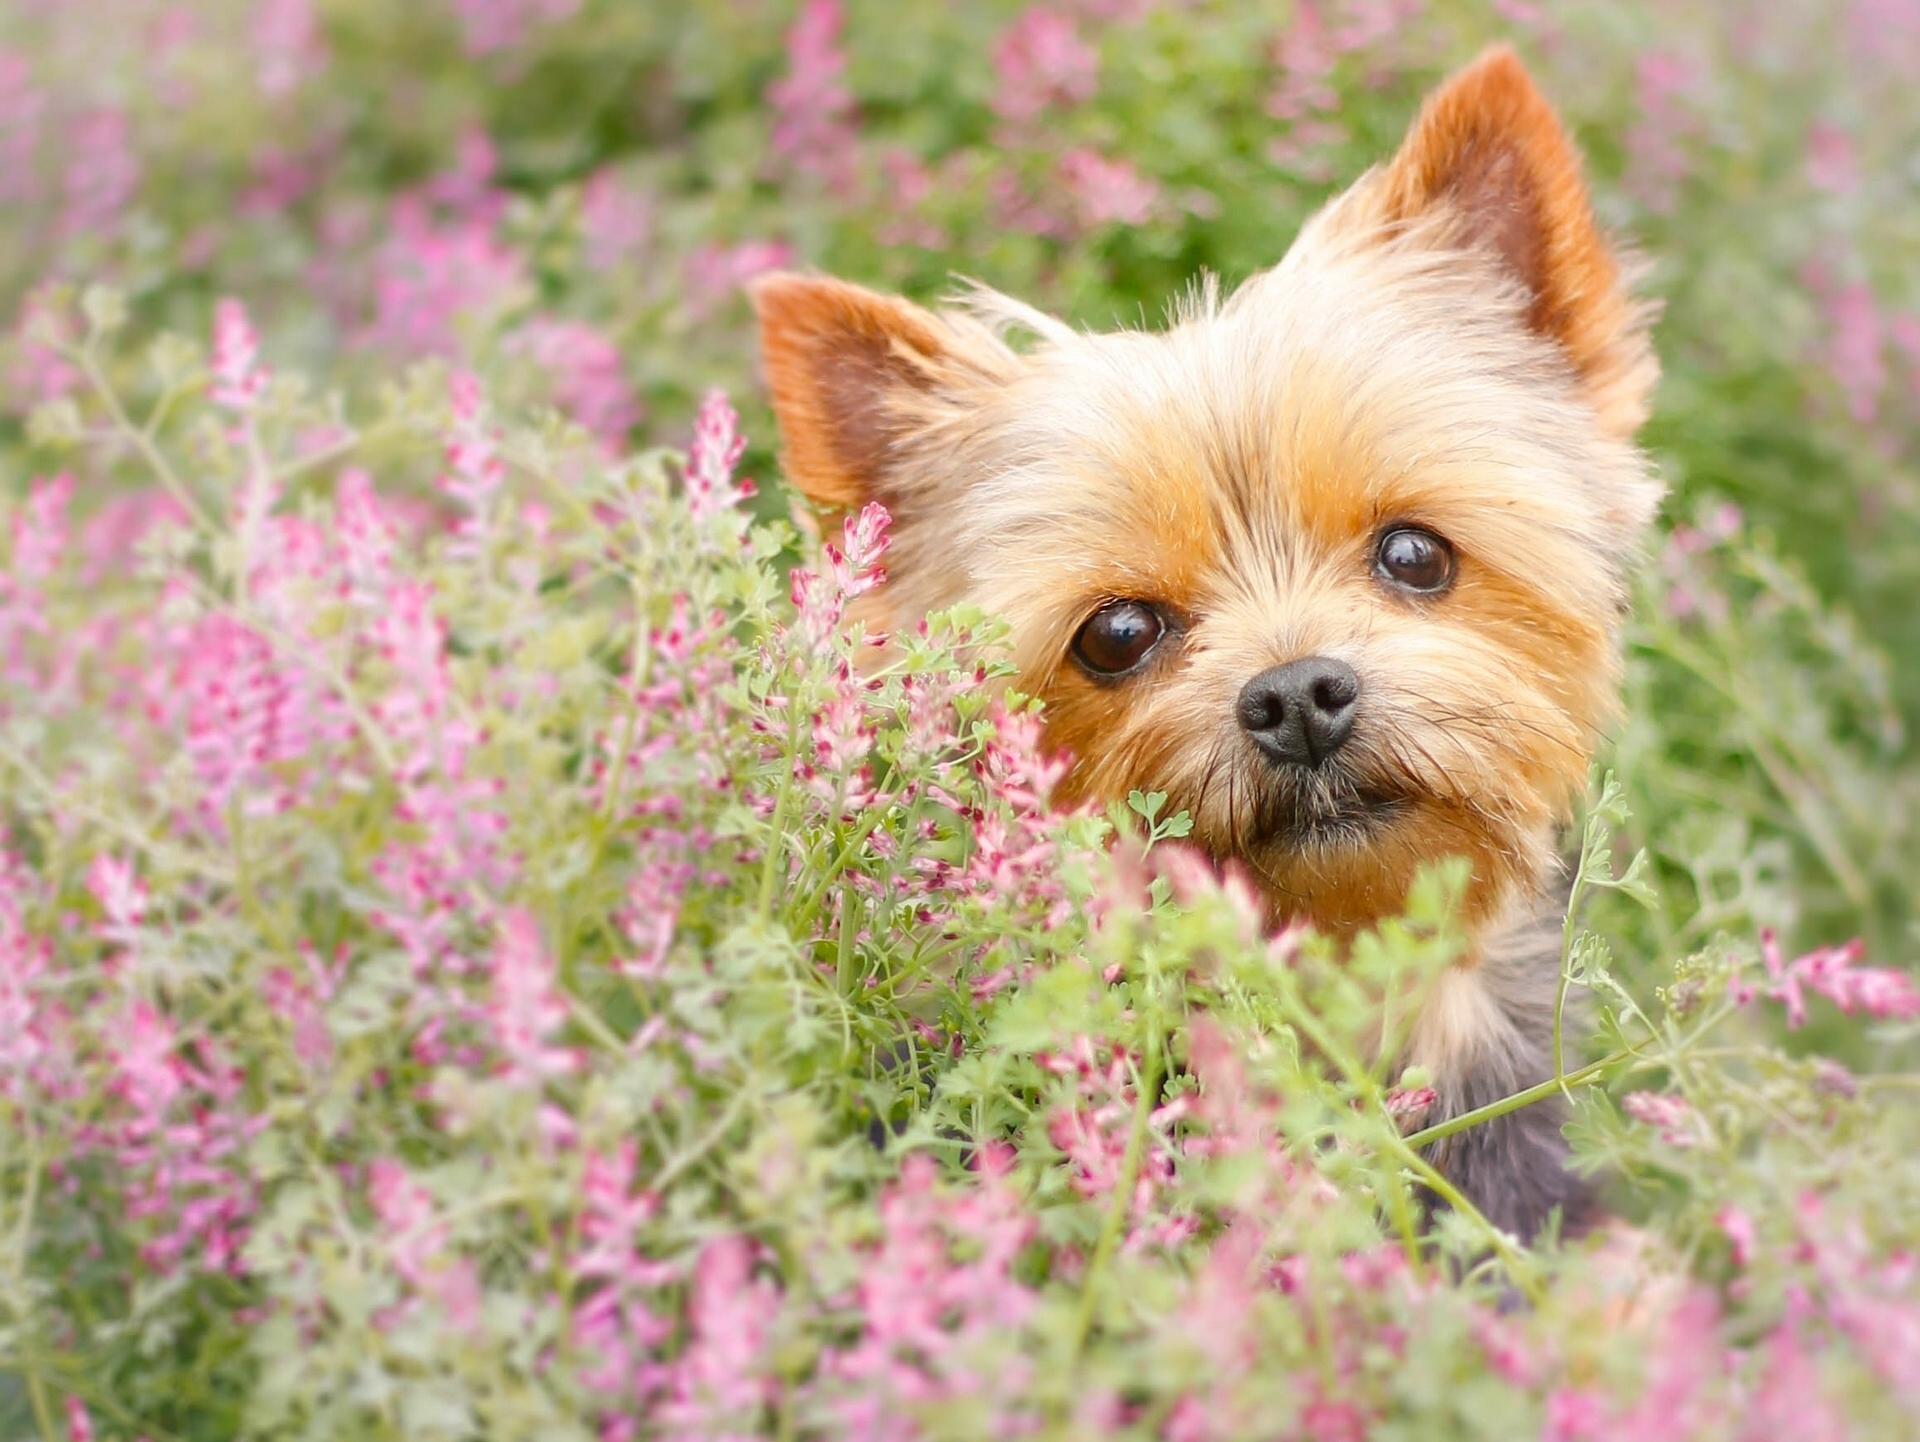 Fond D Ecran Yorkshire Terrier Museau Chiot Fleurs